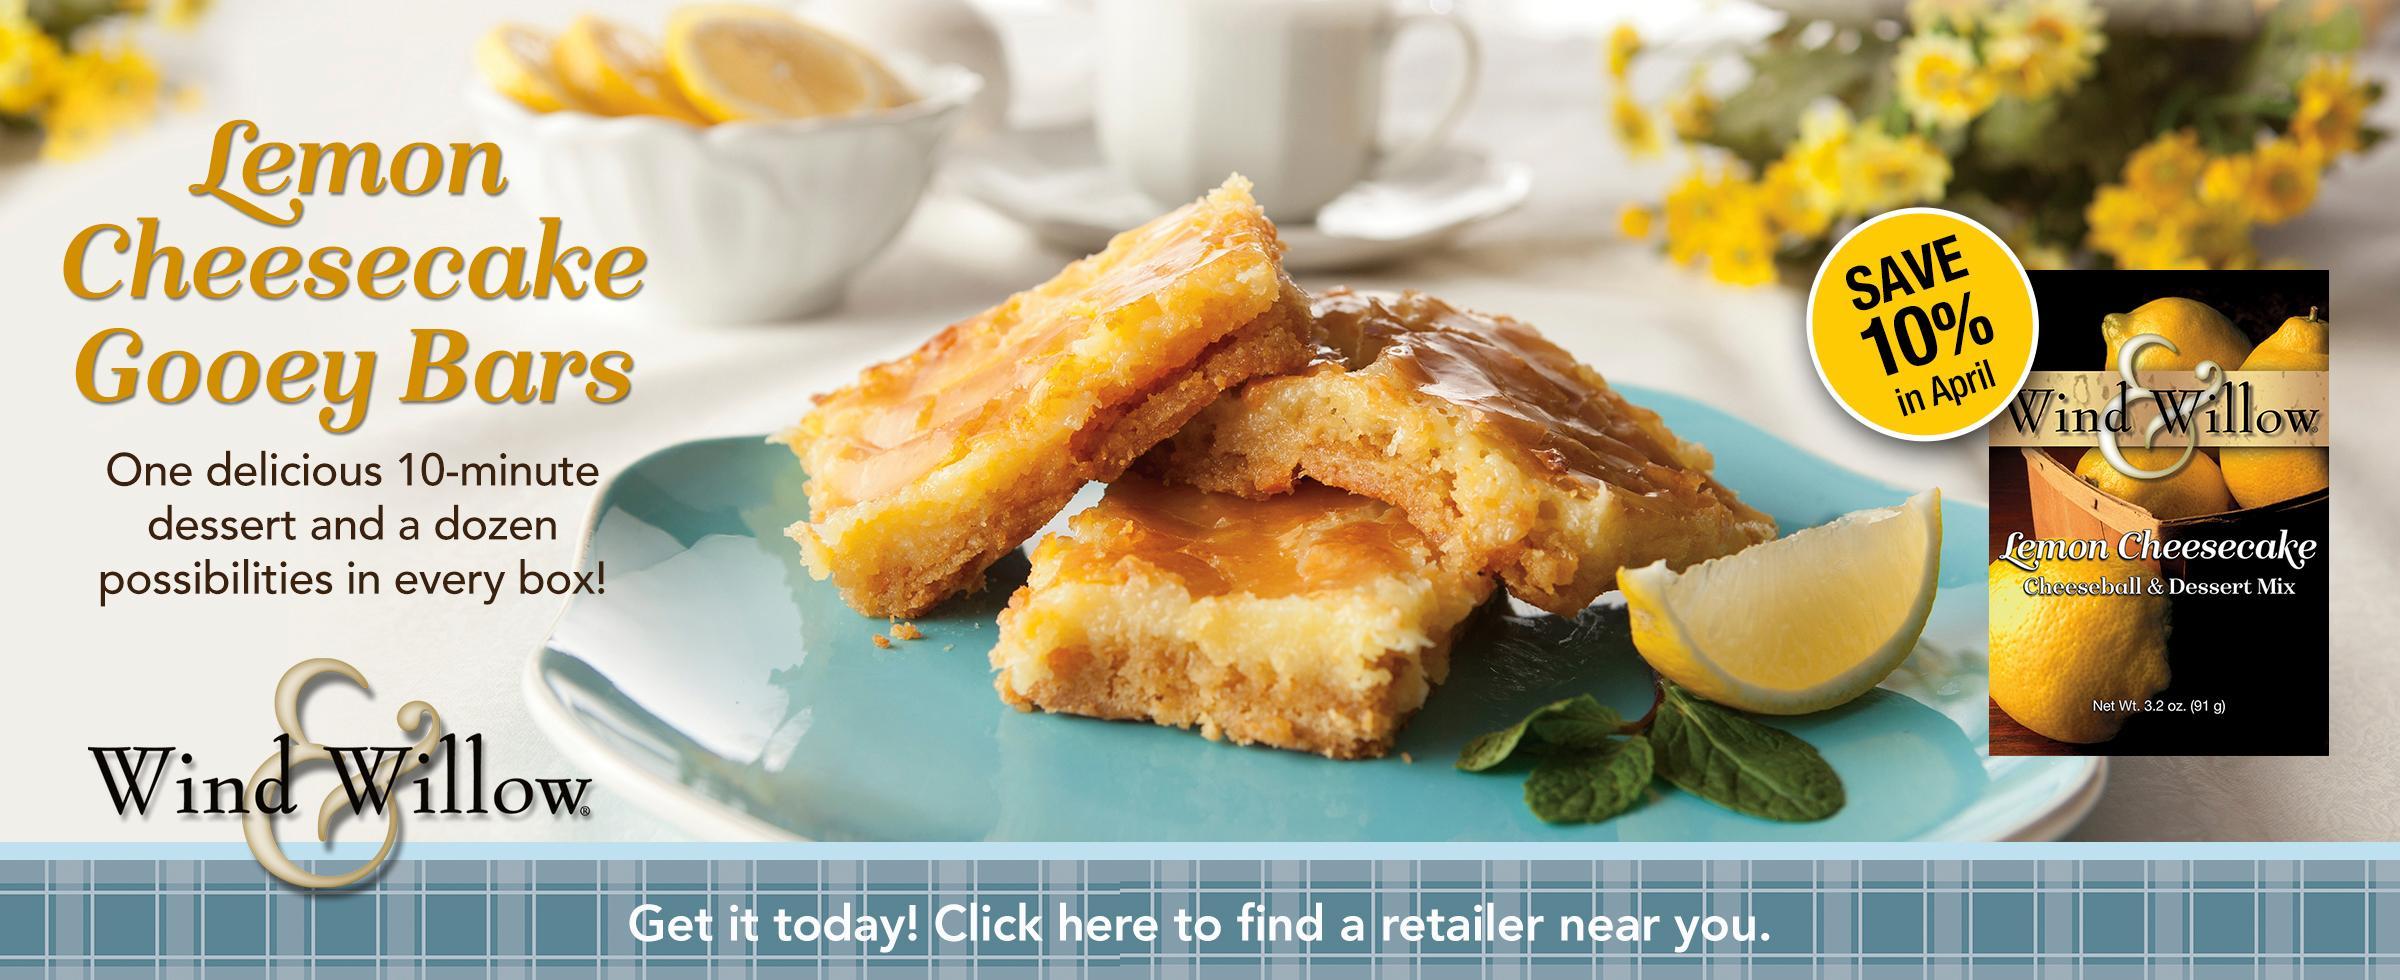 Delicious 10-Minute Dessert